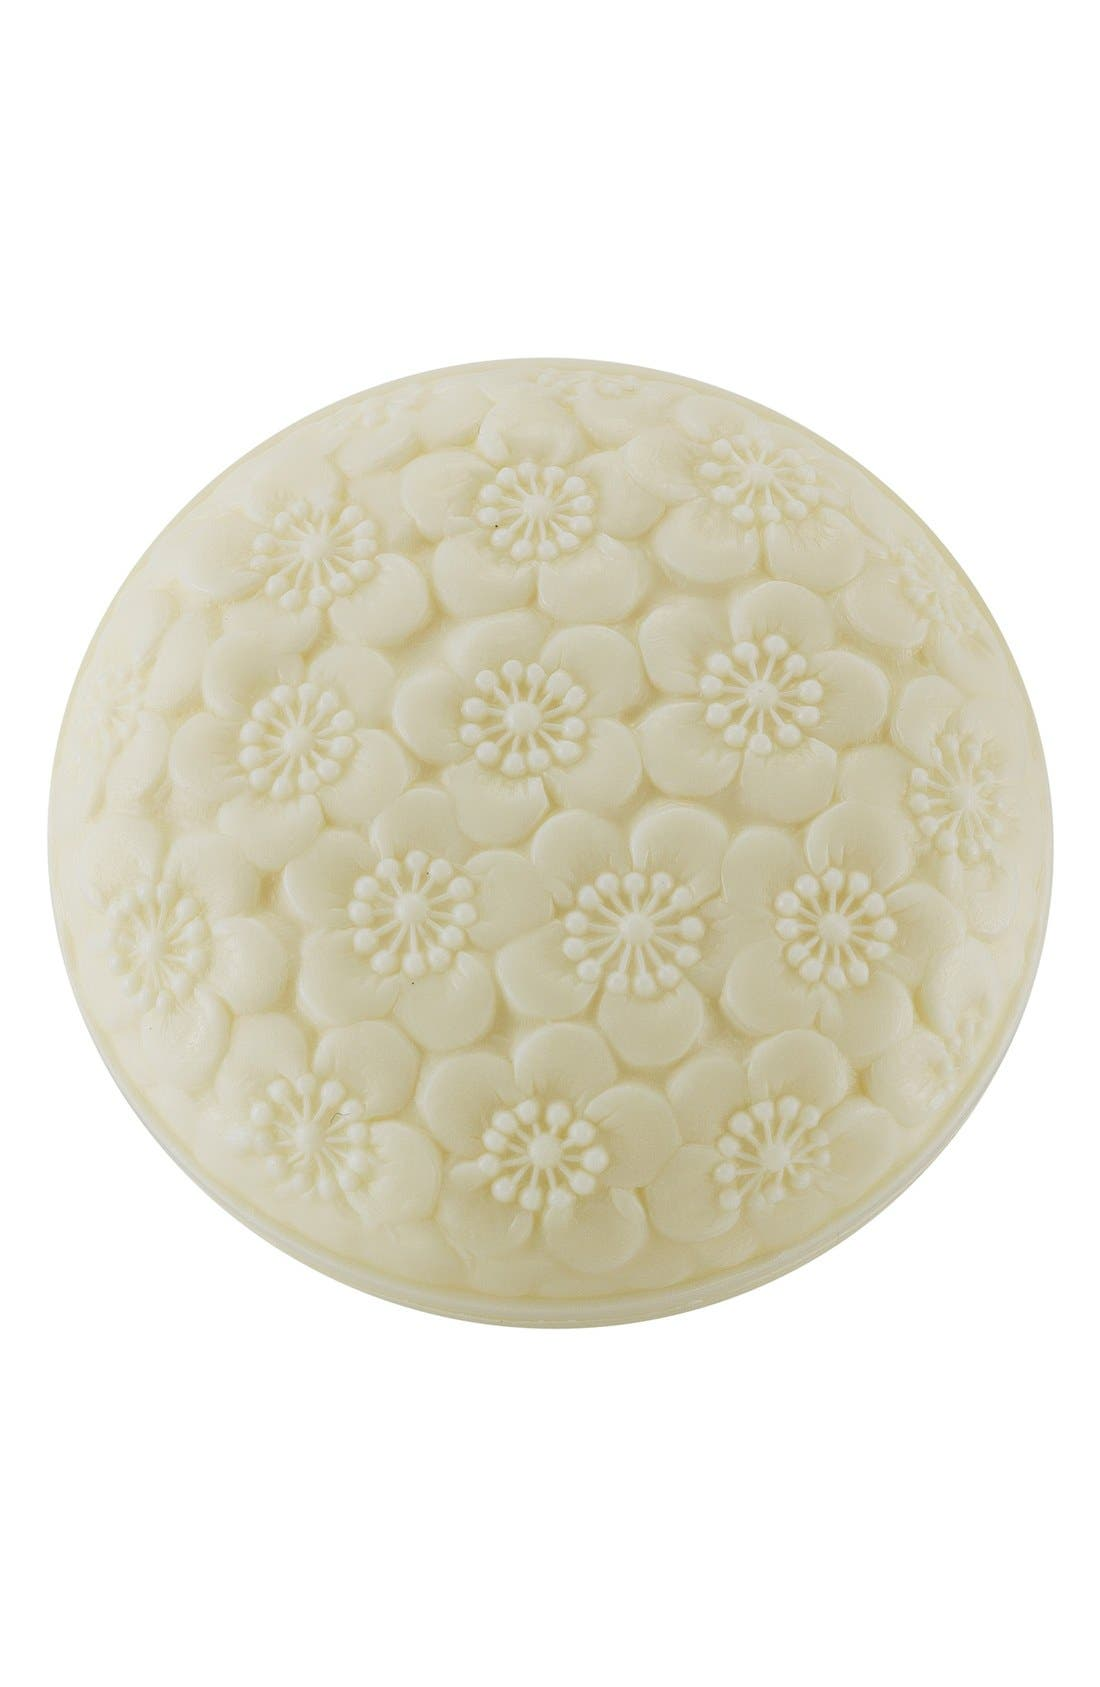 'Spring Flower' Soap,                             Main thumbnail 1, color,                             NO COLOR